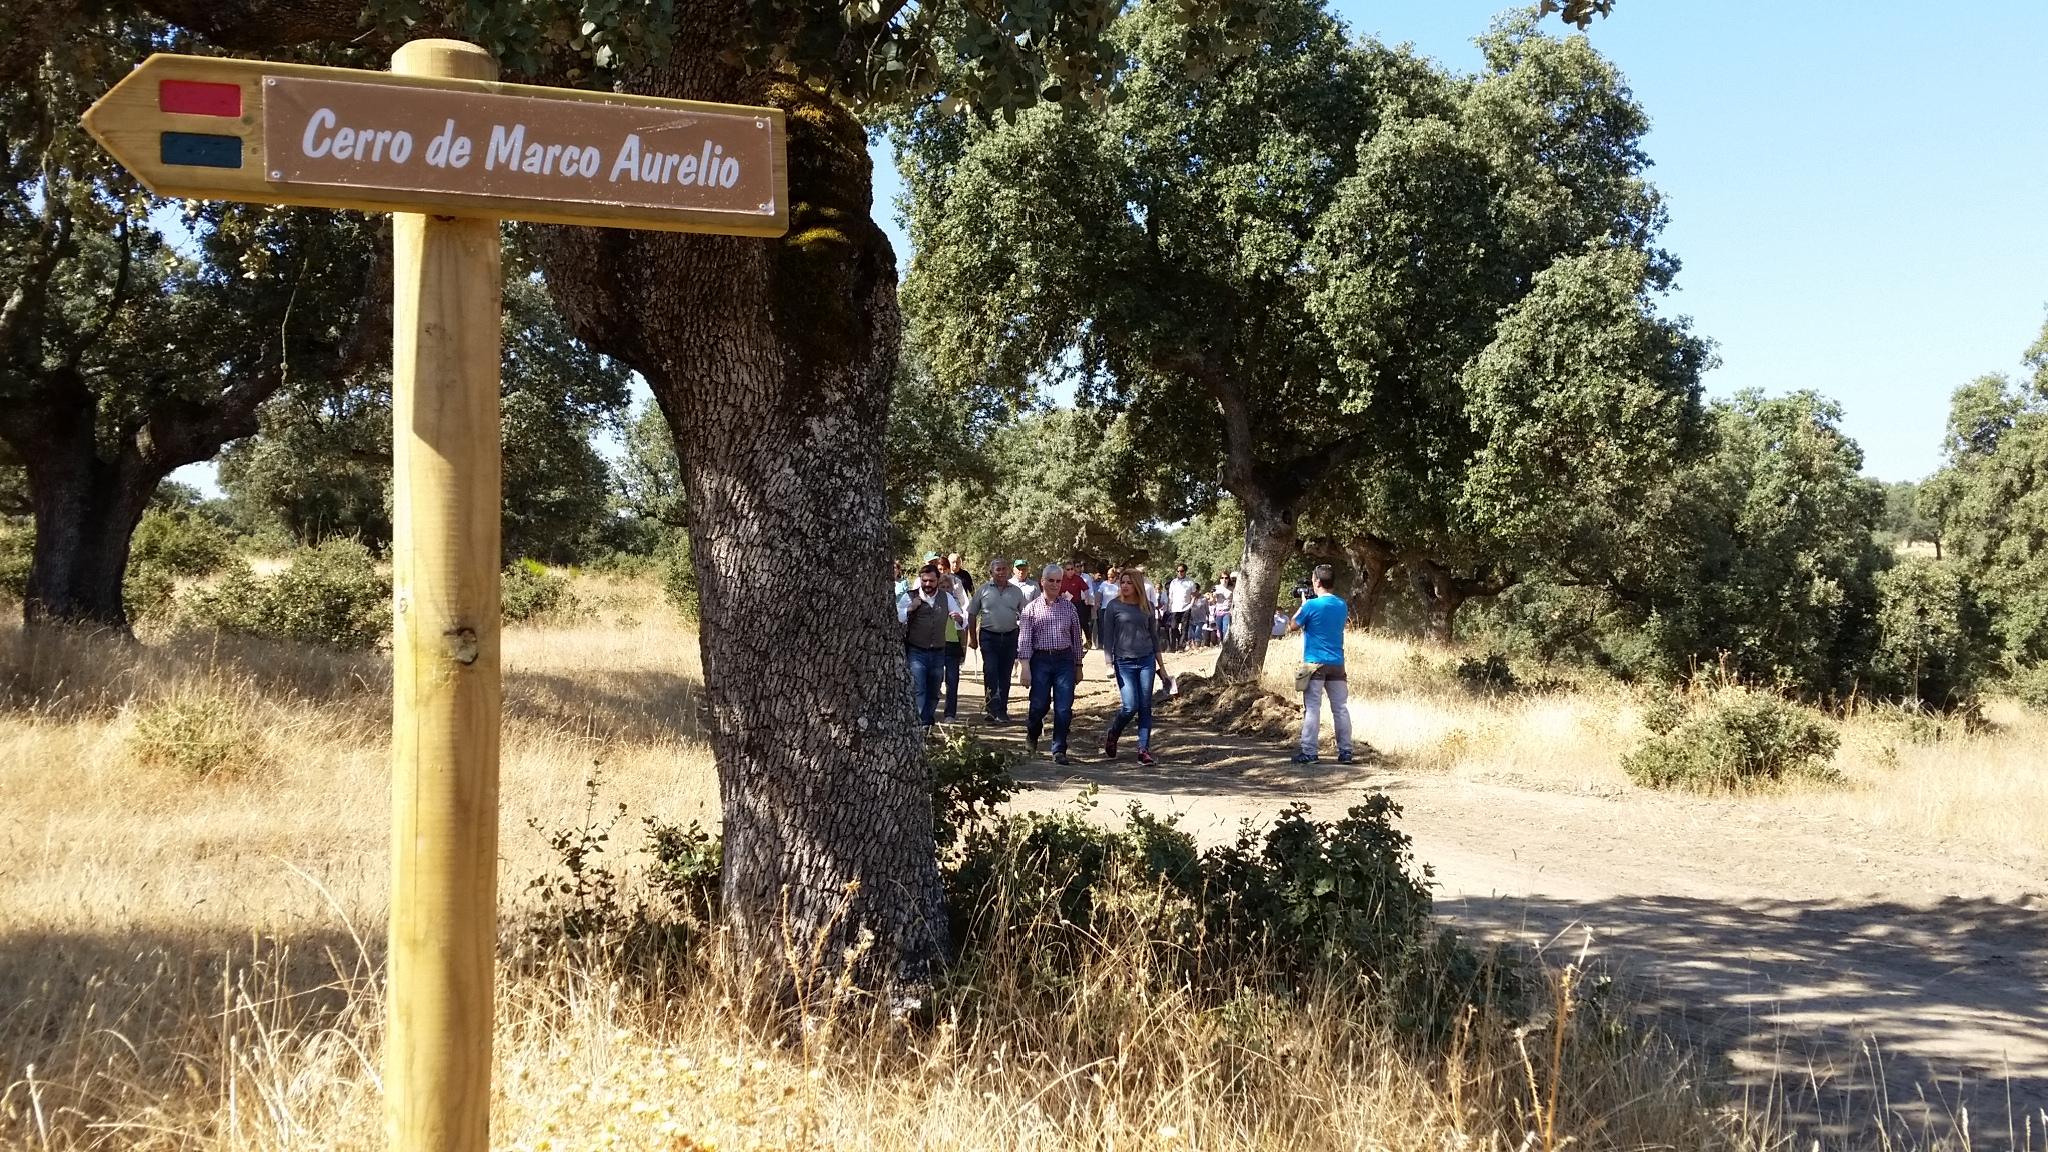 Ruta del Cerro de Marco Aurelio